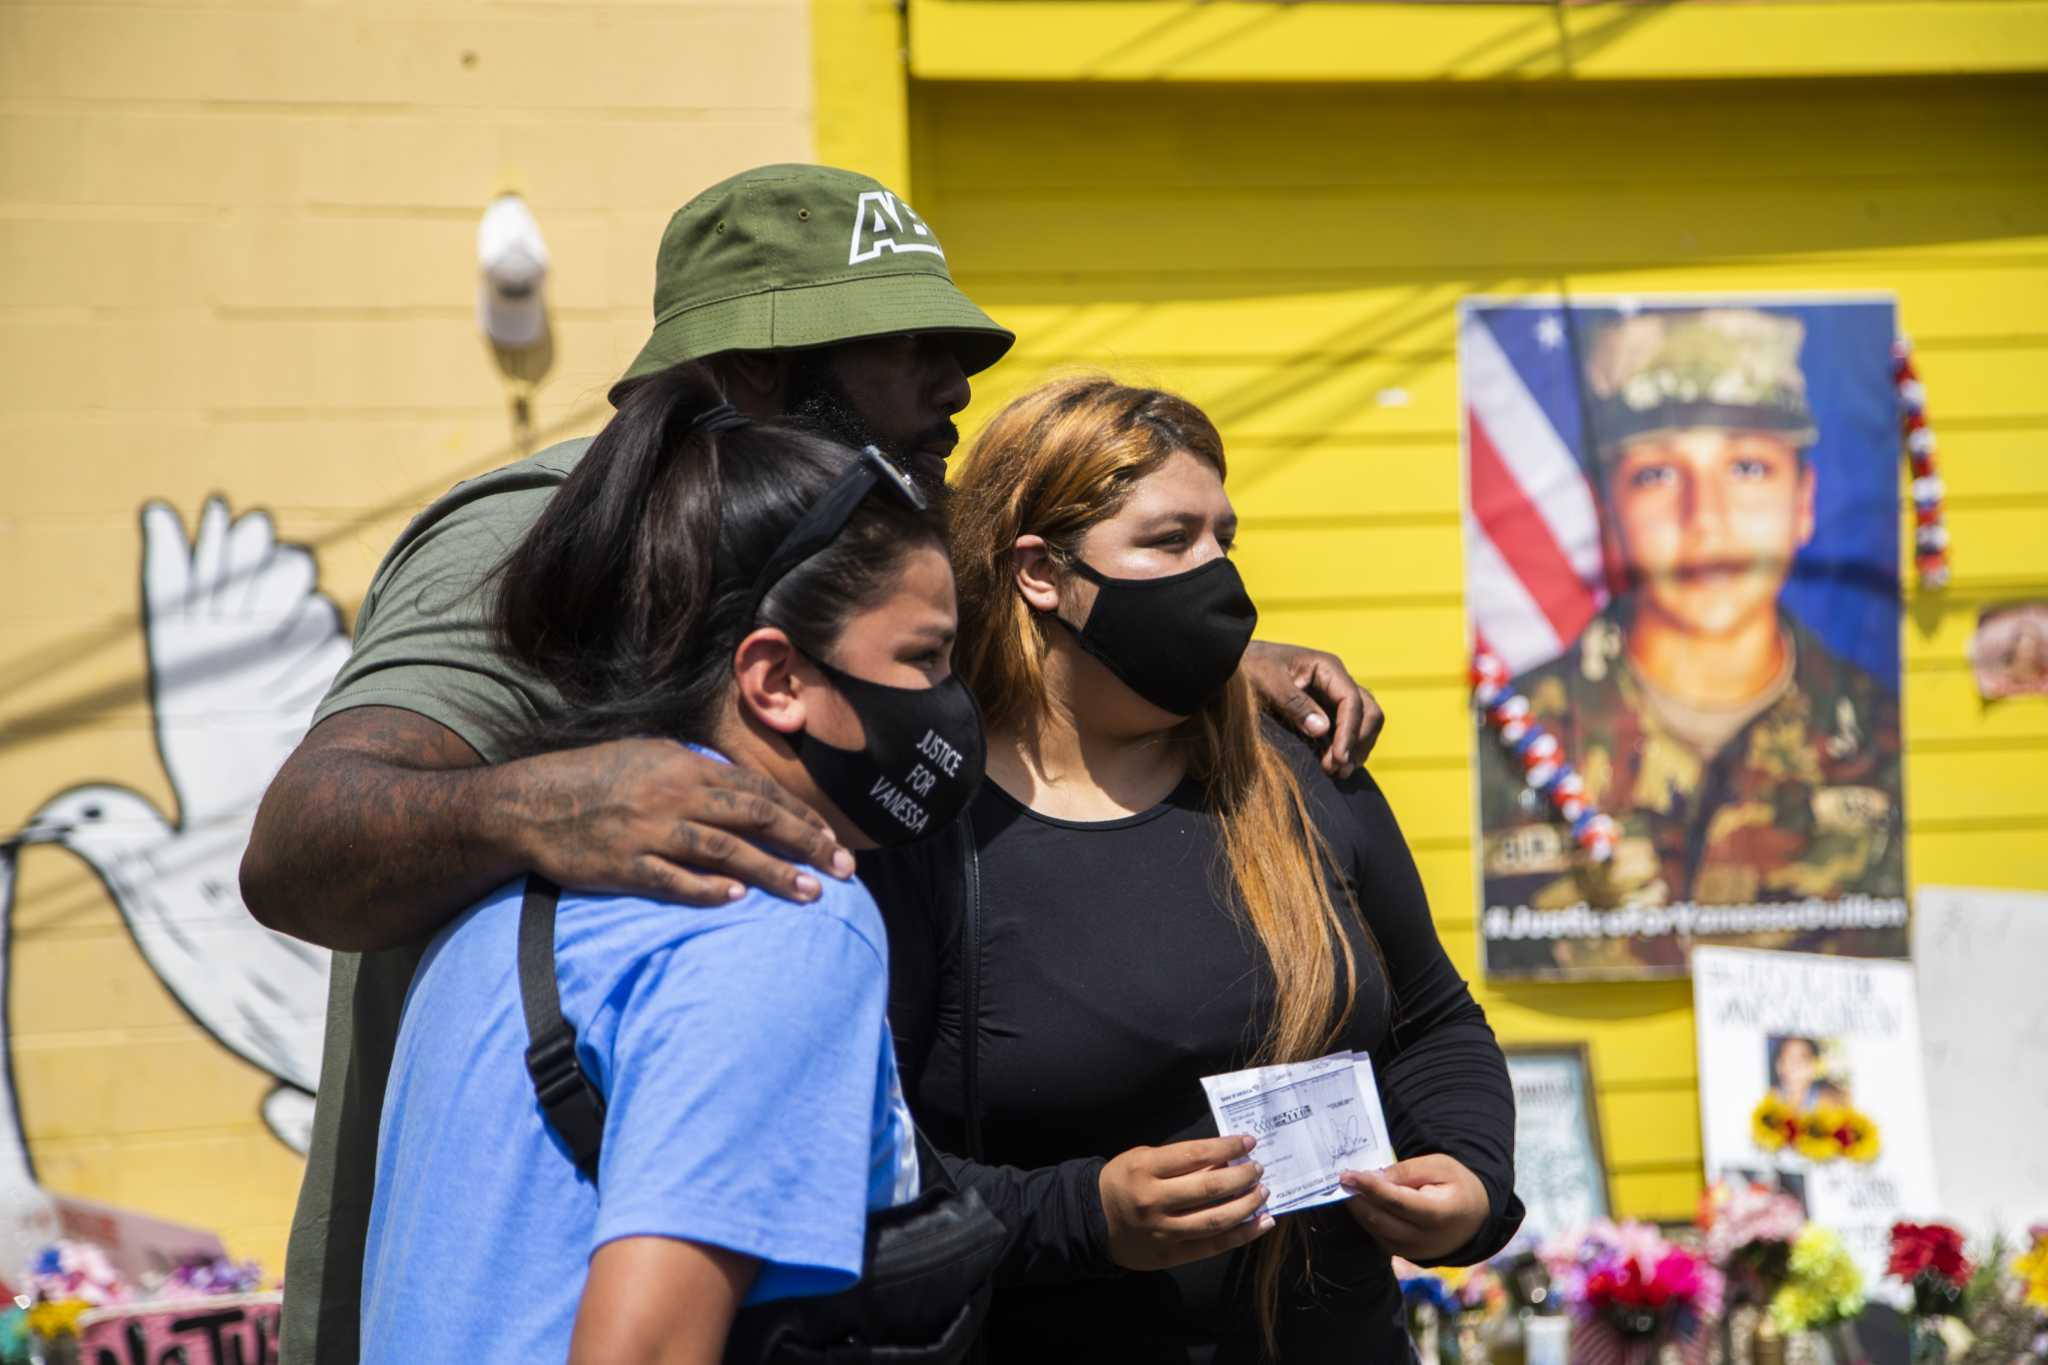 Trae Tha Truth donates $30k to Vanessa Guillén's family